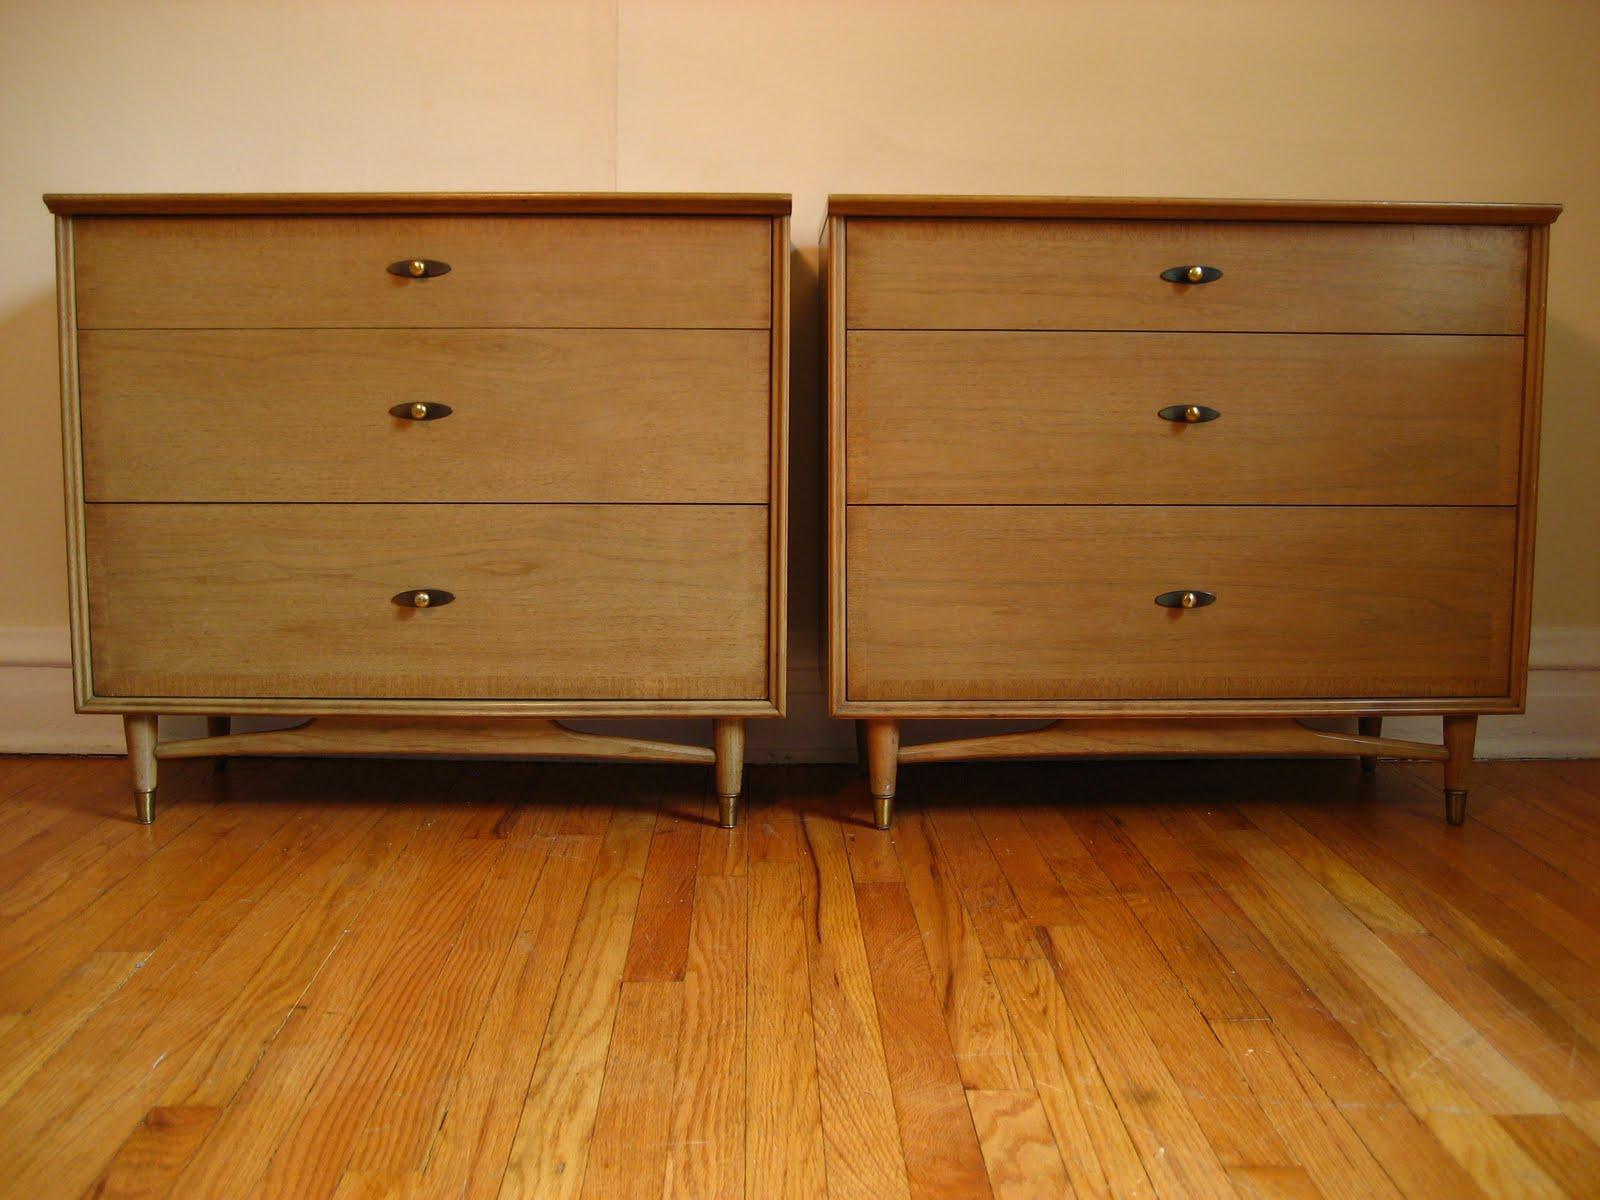 Kroehler Mid Century Desk Dresser Units Images Frompo